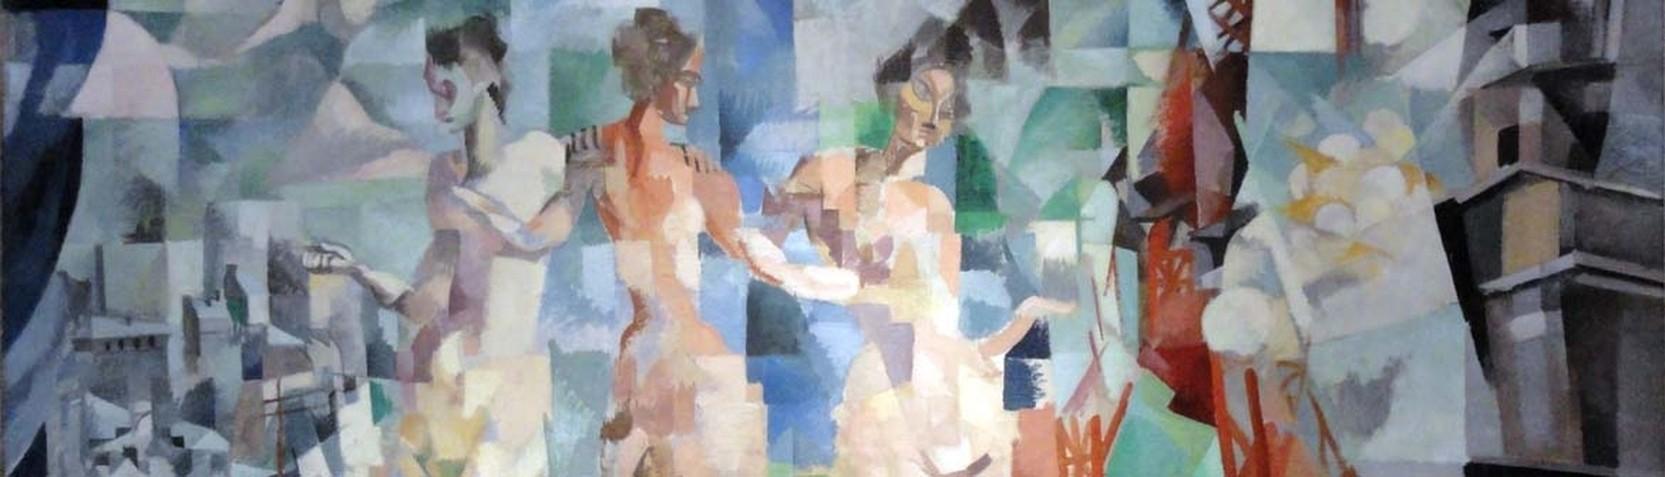 Künstler - Robert Delaunay